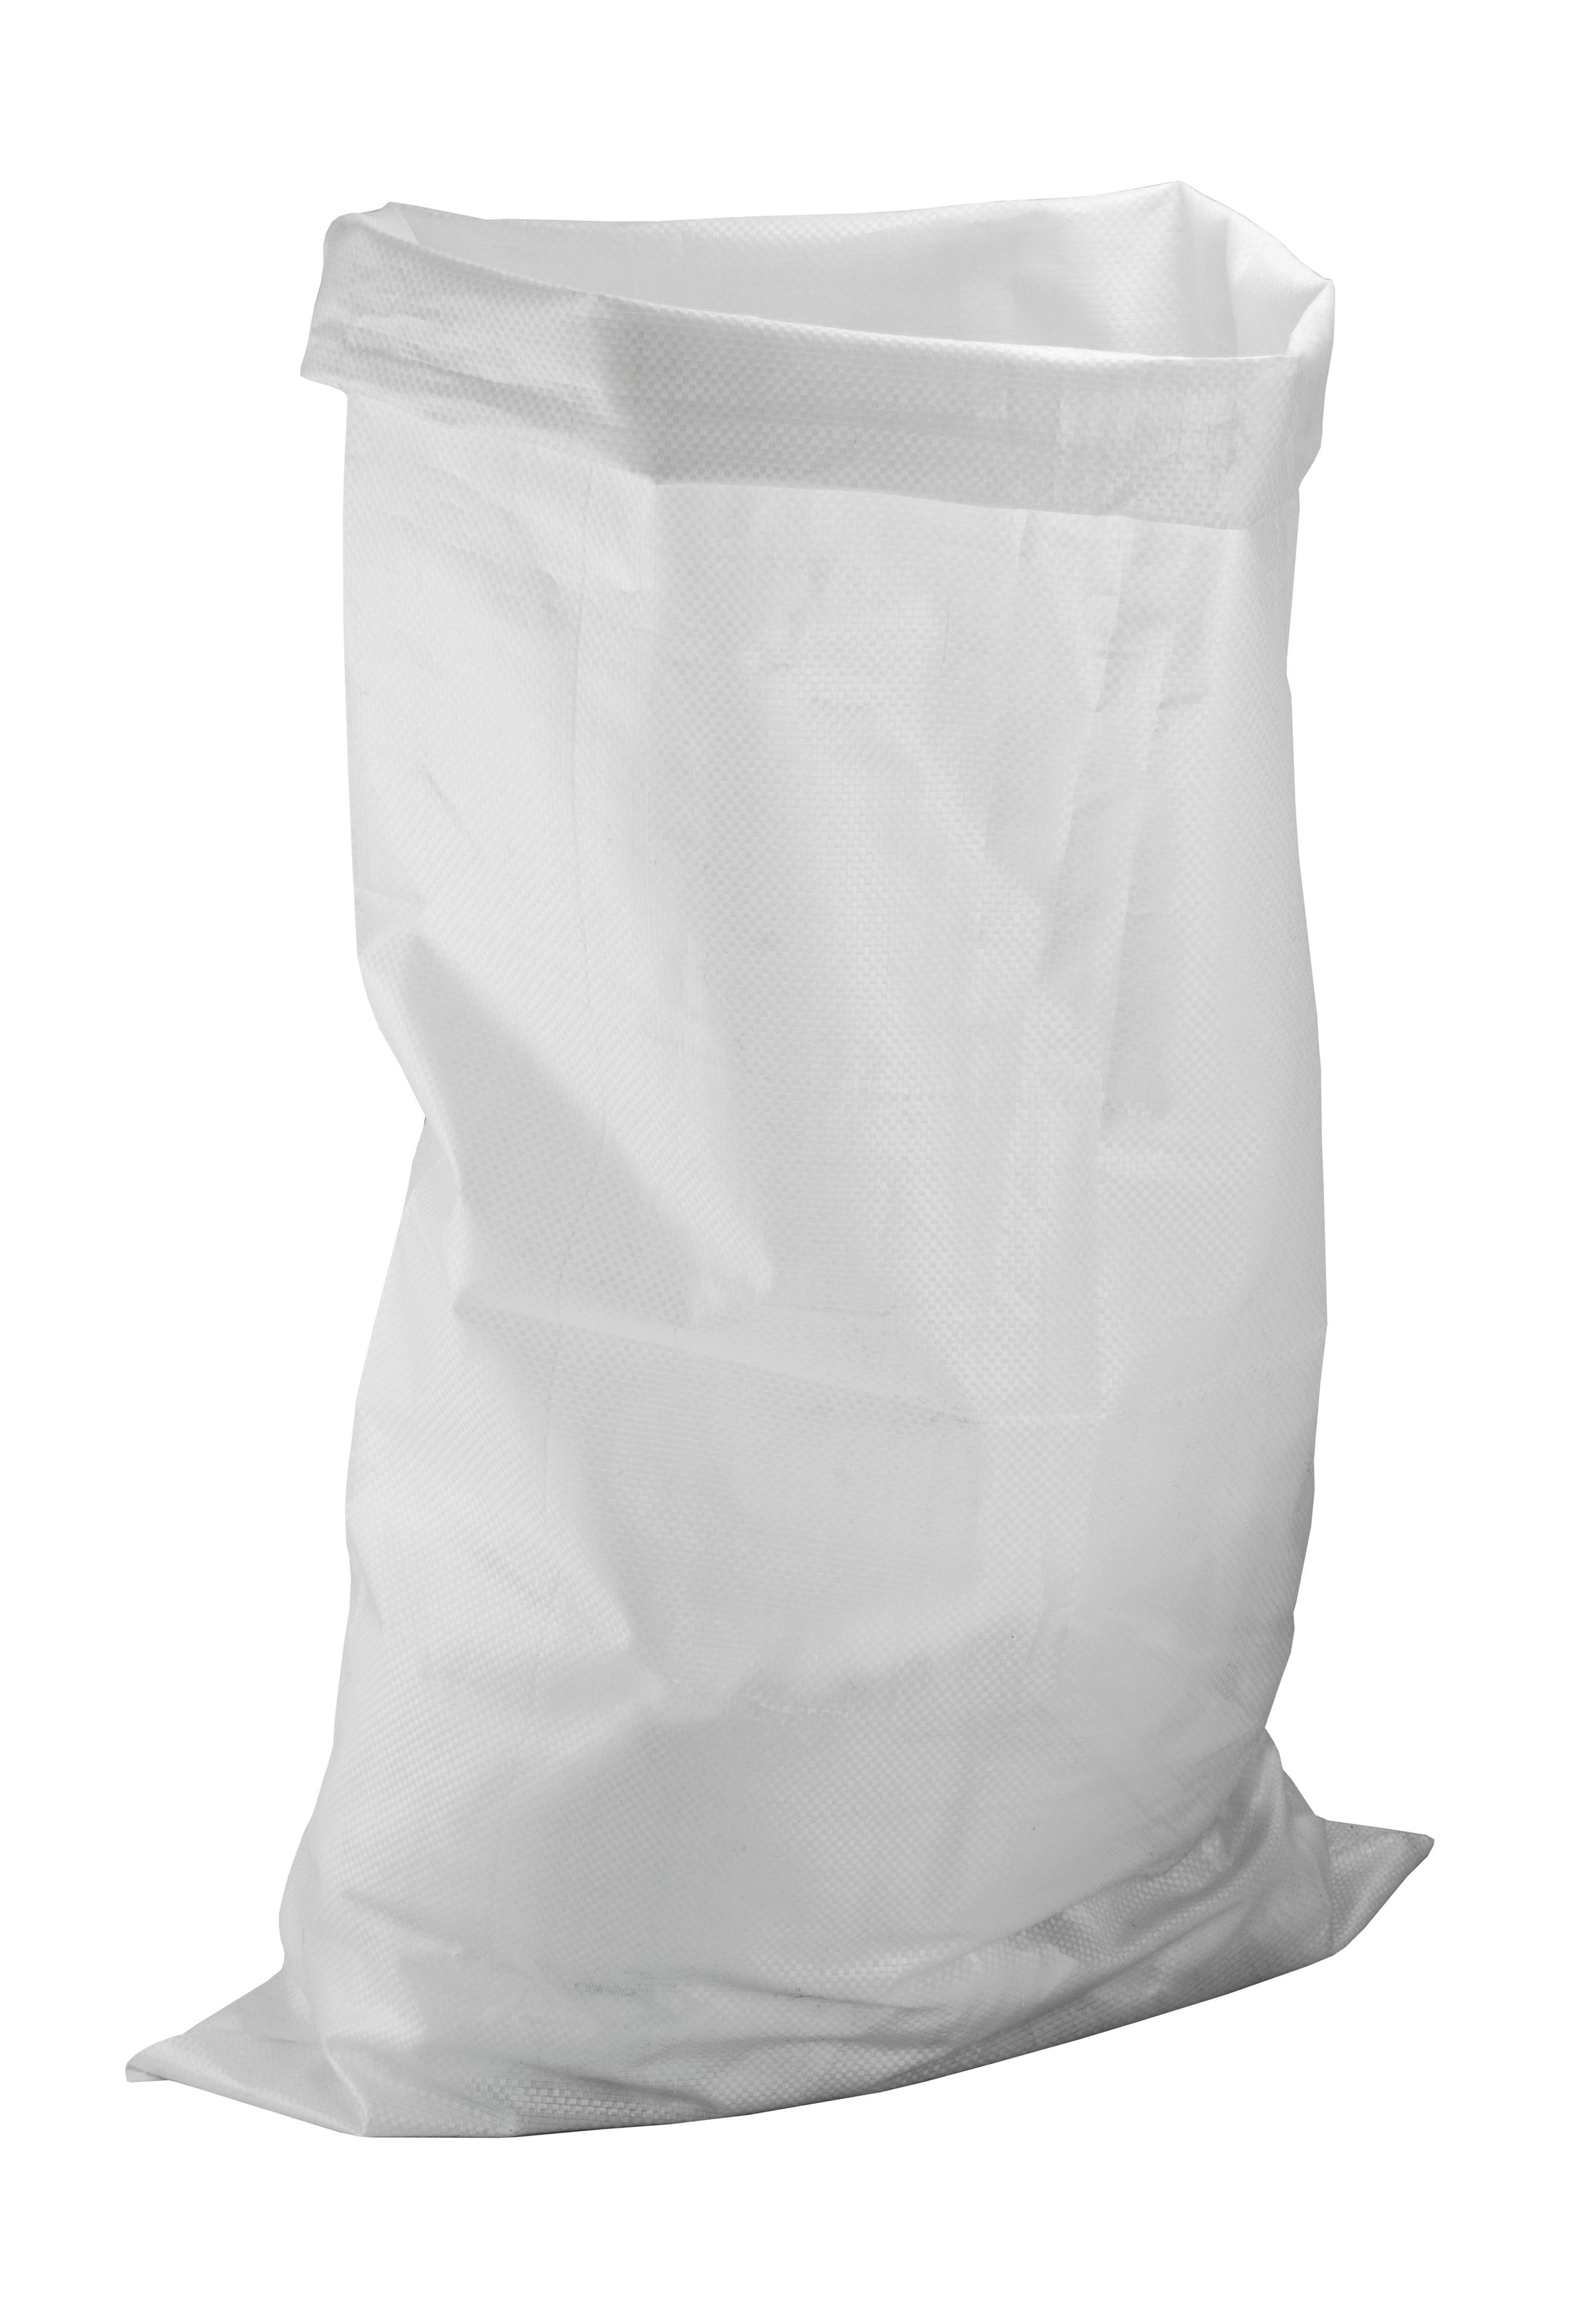 Stavebné vrece PP, 50x85 cm, 65 g/m2, biele, 80 L